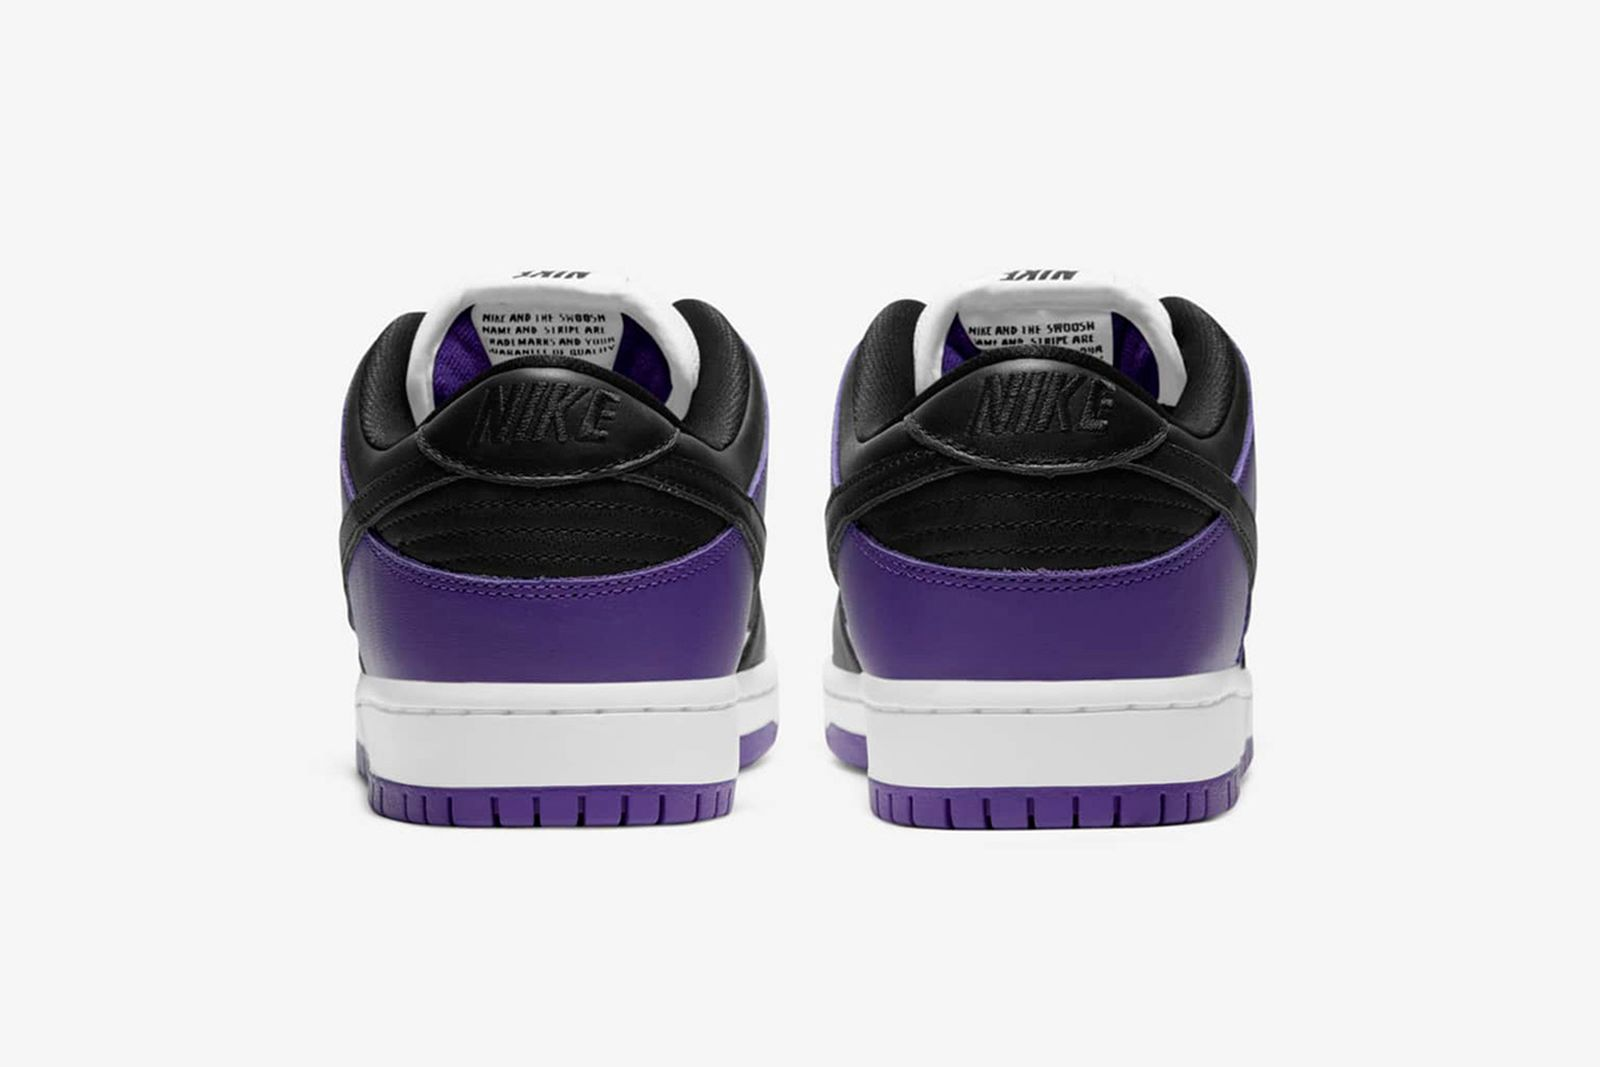 nike-sb-dunk-low-court-purple-release-date-price-04